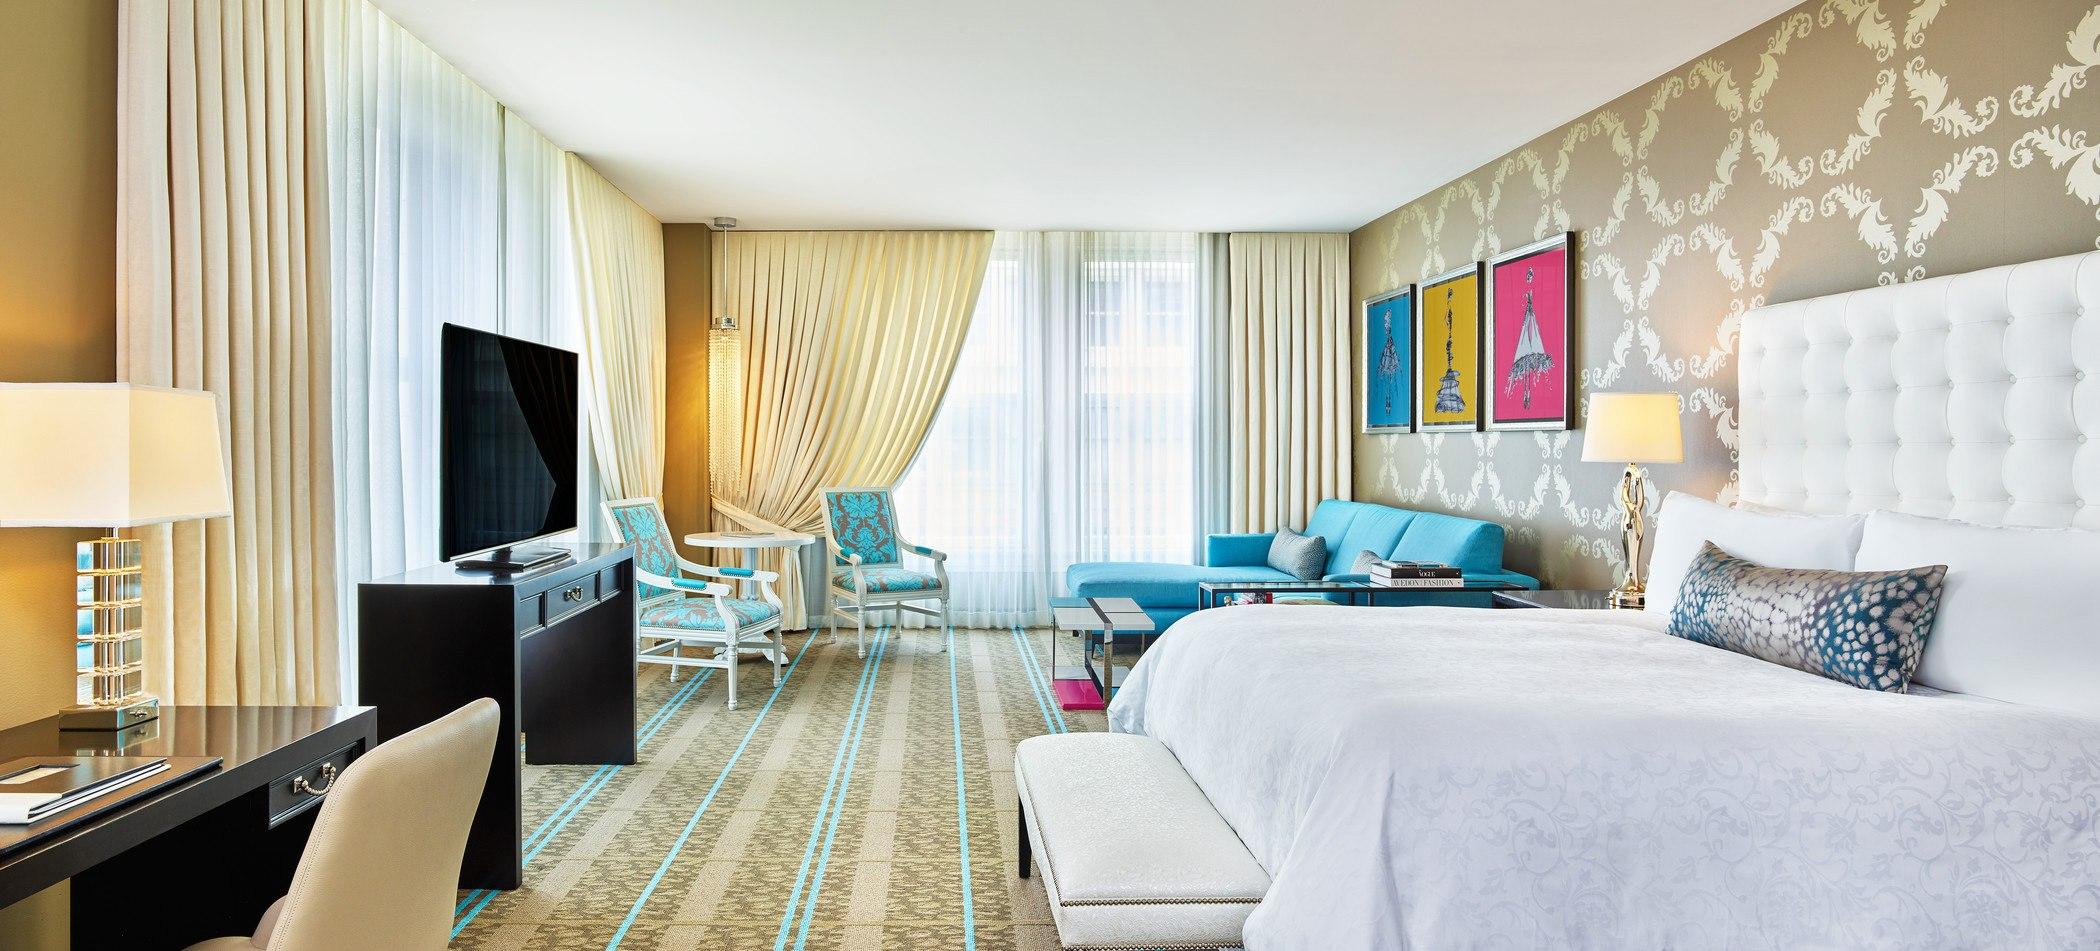 the-nines-hotel-portland-Studio-Suite